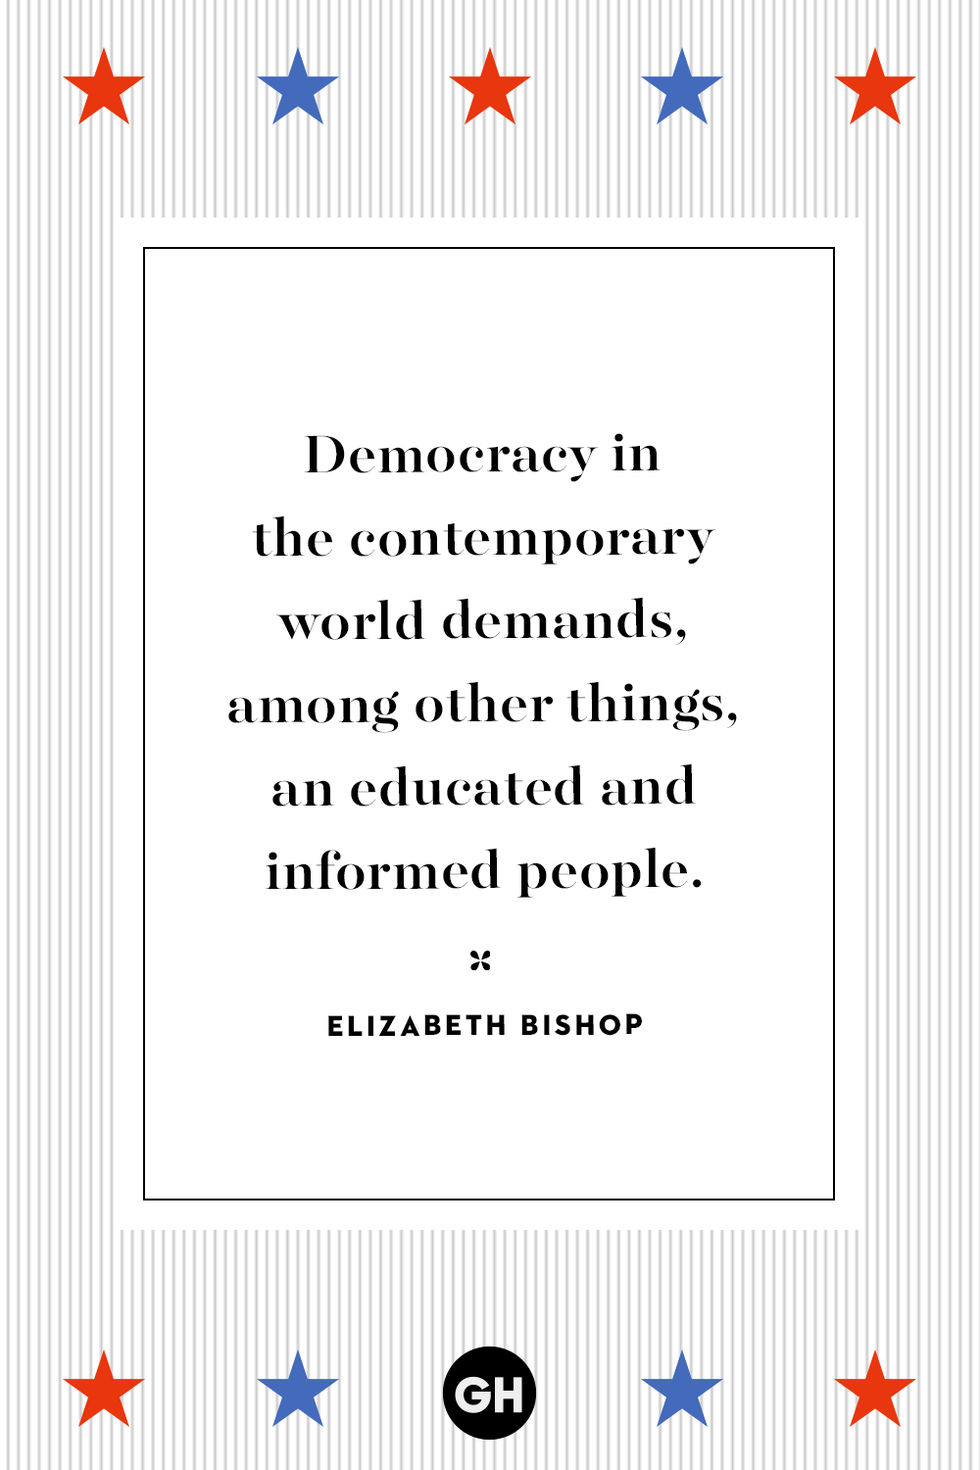 election-quotes-voting-quotes-18-elizabeth-bishop-1567019365